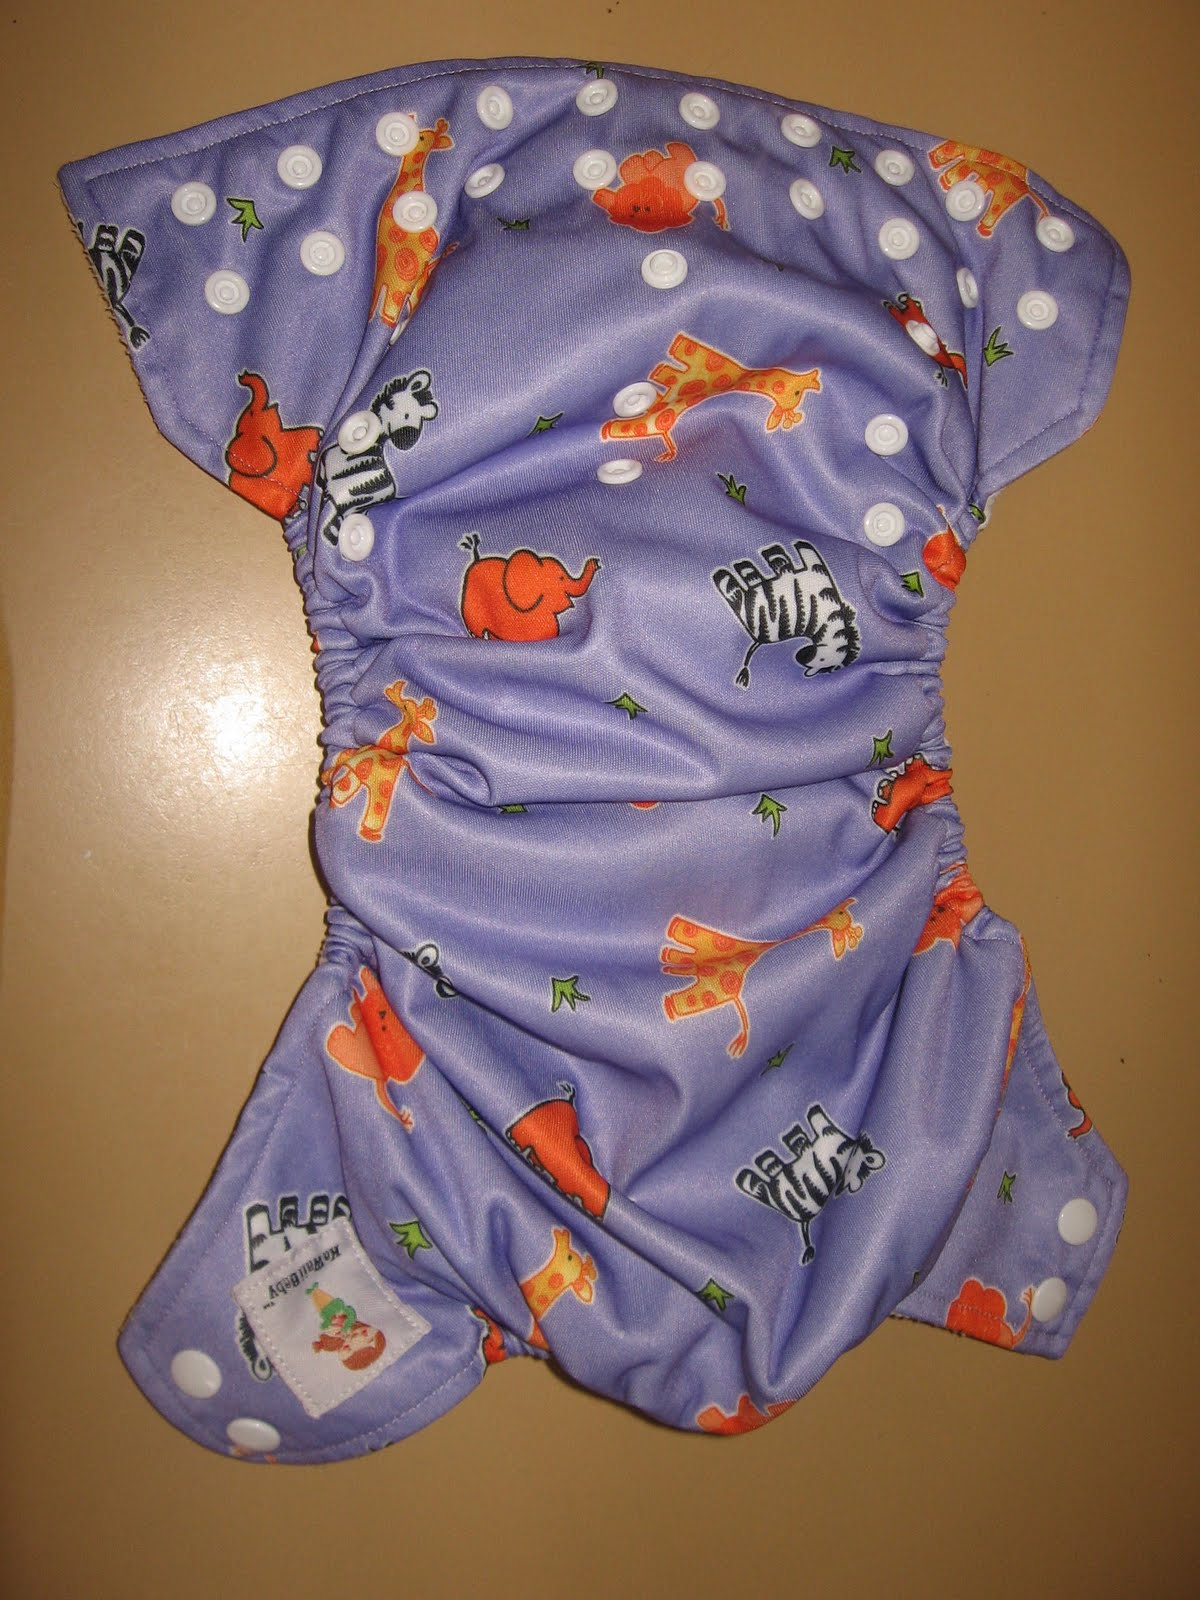 cloth diaper addiction night time diapering kawaii baby